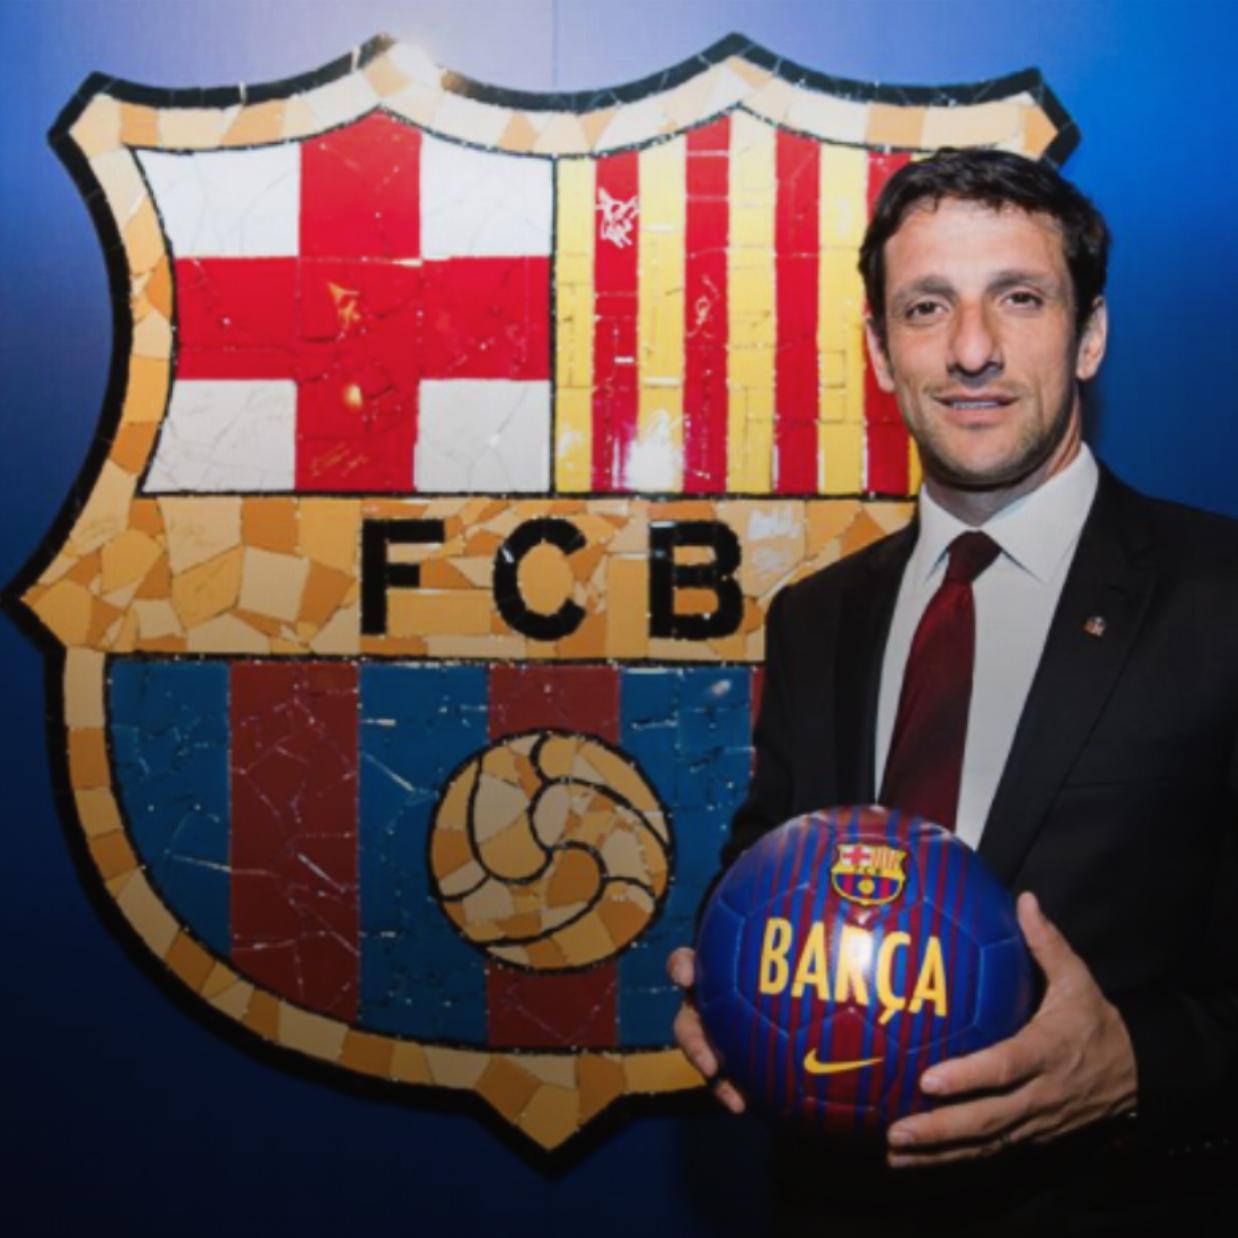 F.C. BARCELONA -